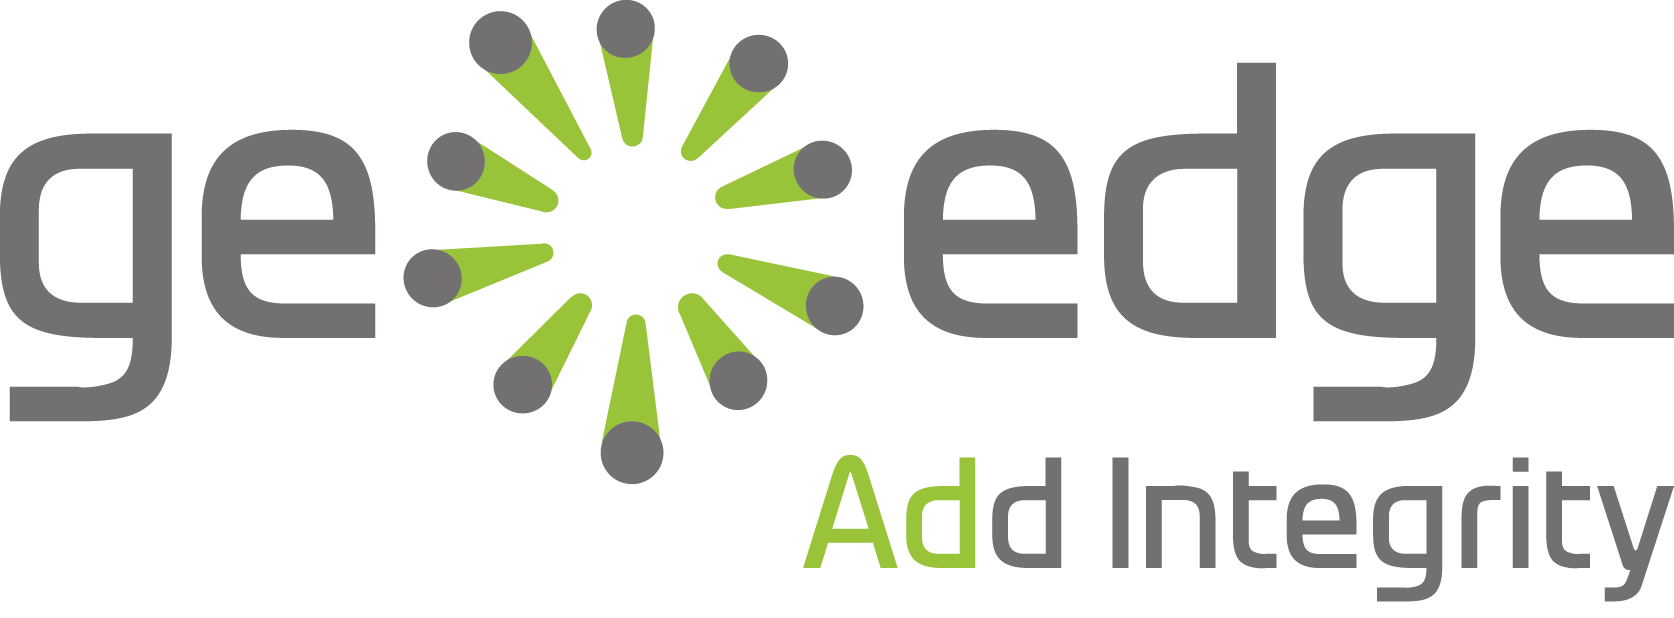 GeoEdge Logo